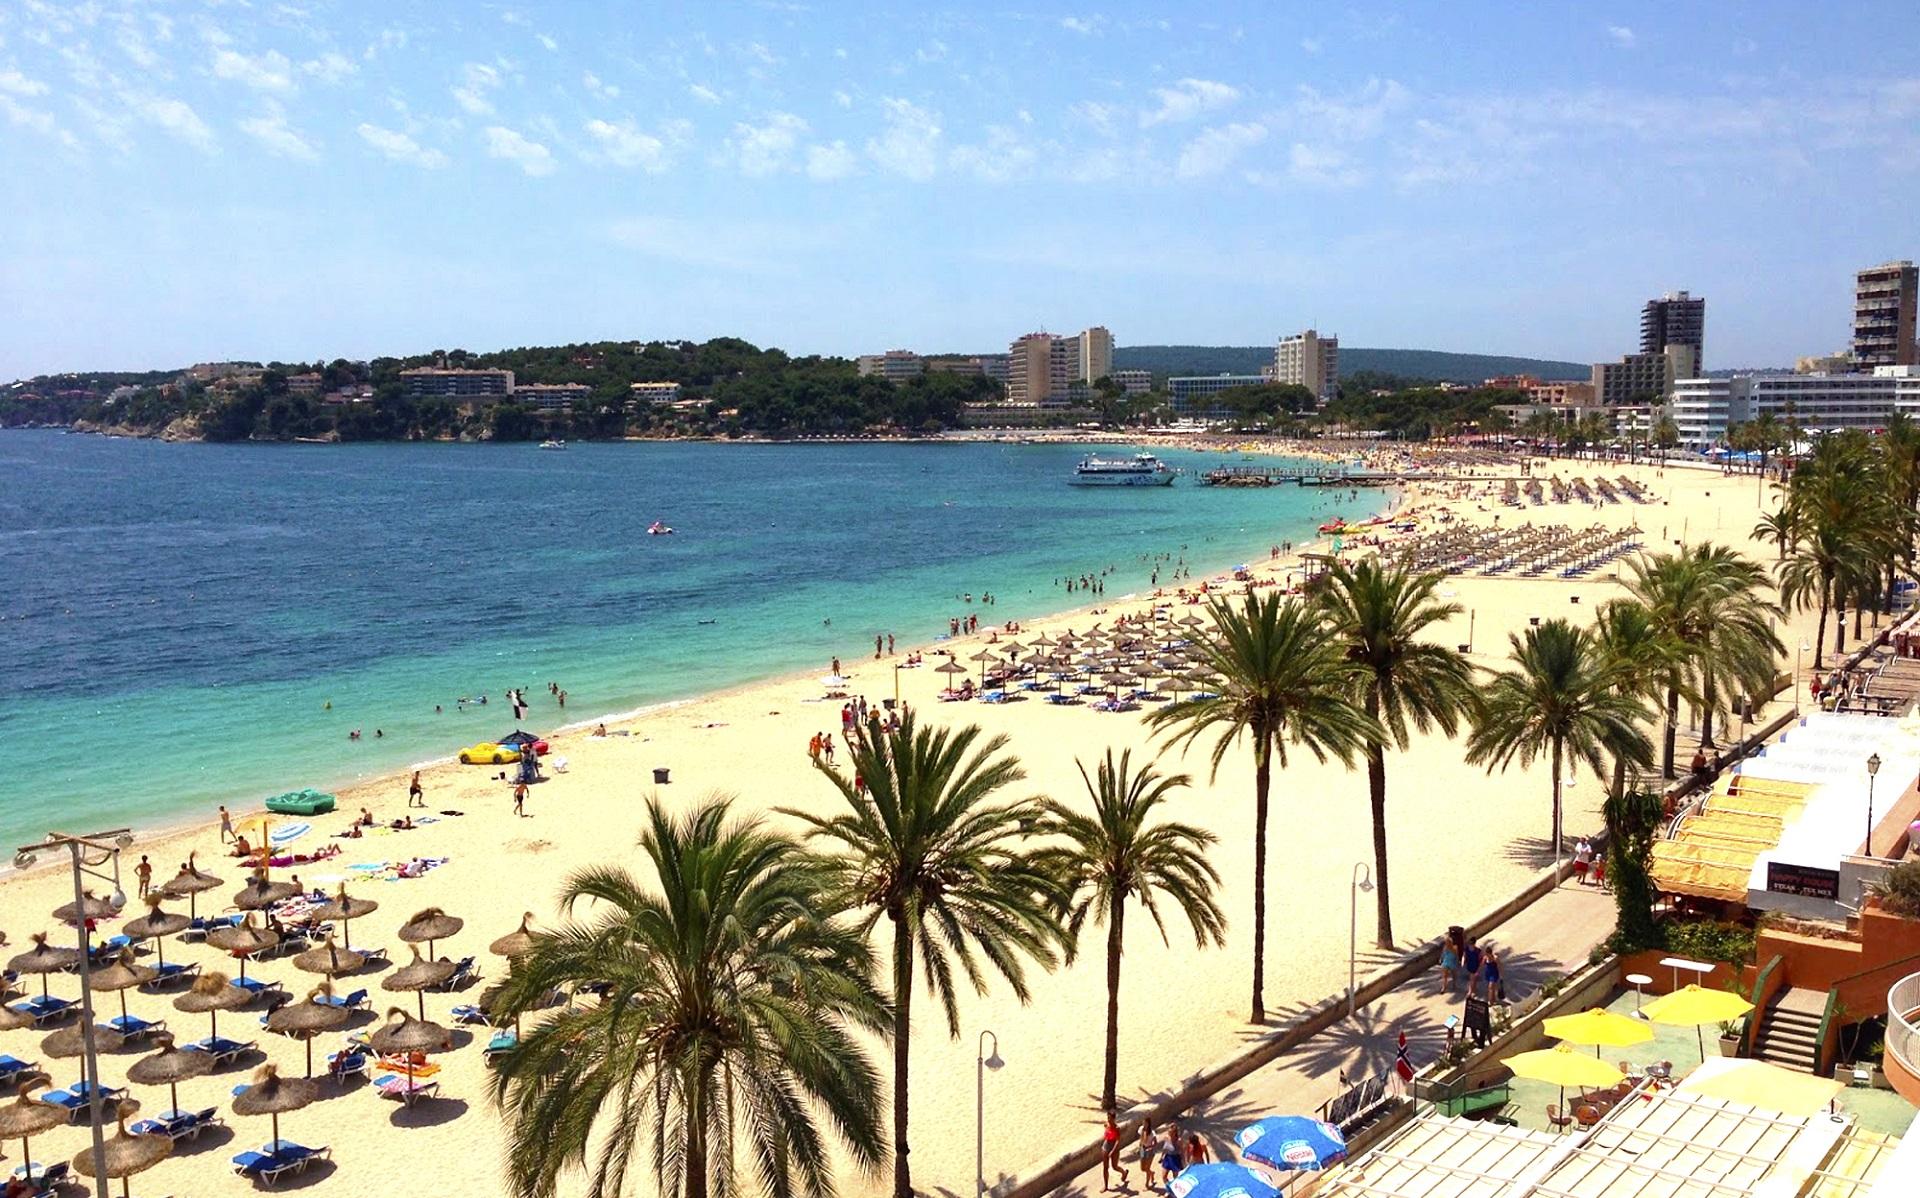 Magaluf sull'isola di Maiorca